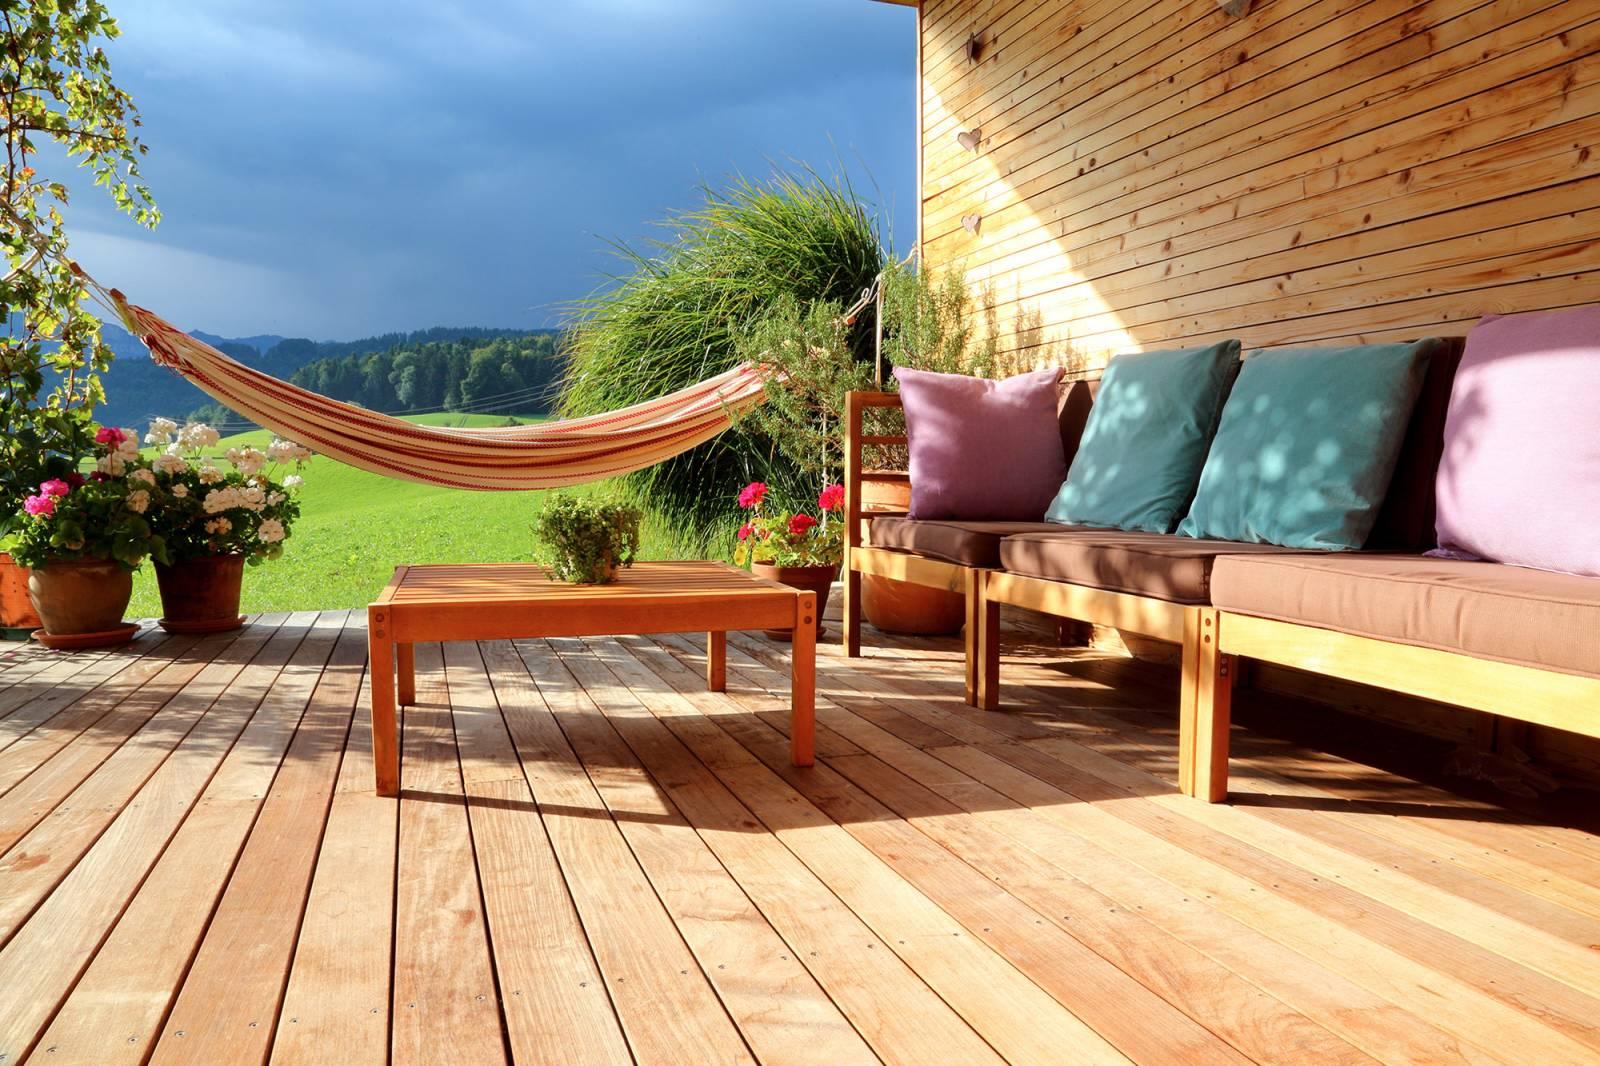 achat spa et jacuzzi en magasin sur toulouse innovation terrasses spas. Black Bedroom Furniture Sets. Home Design Ideas